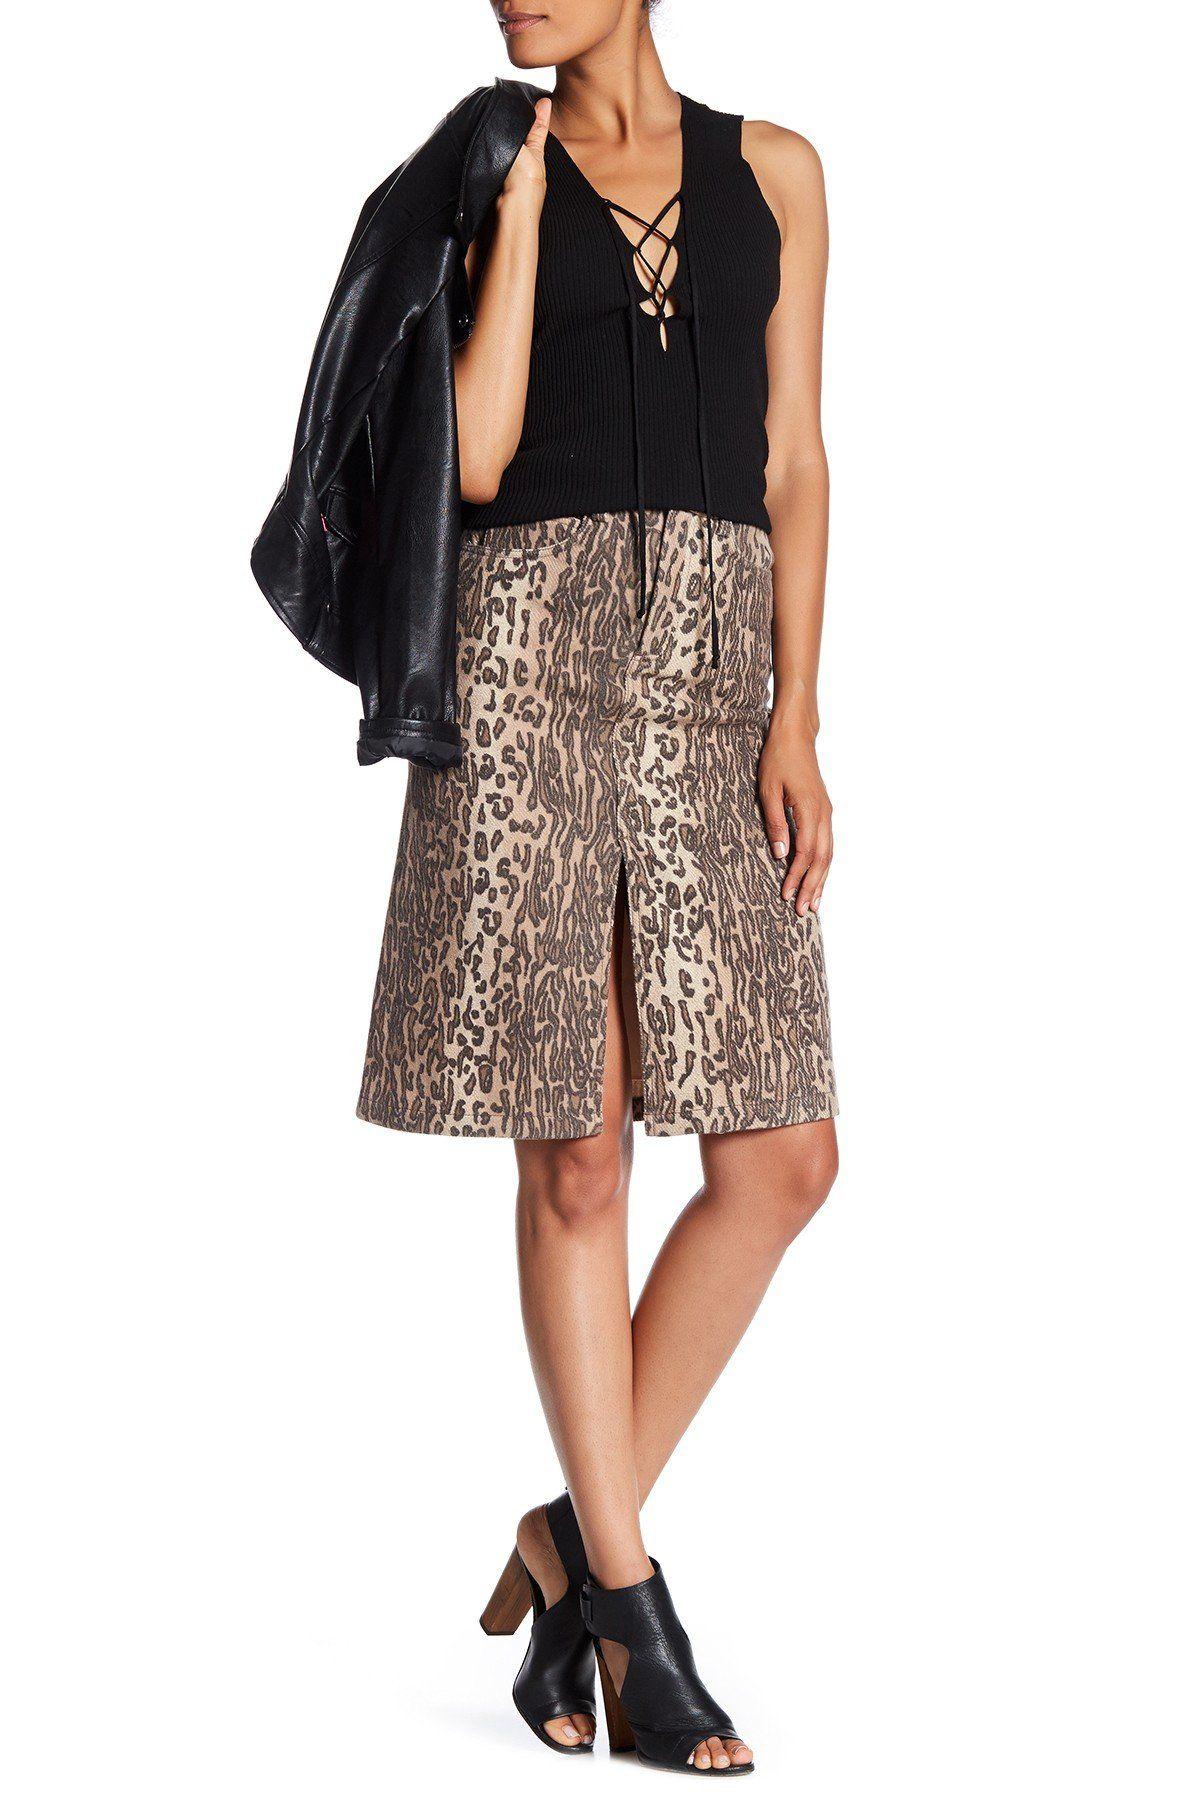 6ce6de450c14 Lynx Wool Blend Midi Skirt Classic Style